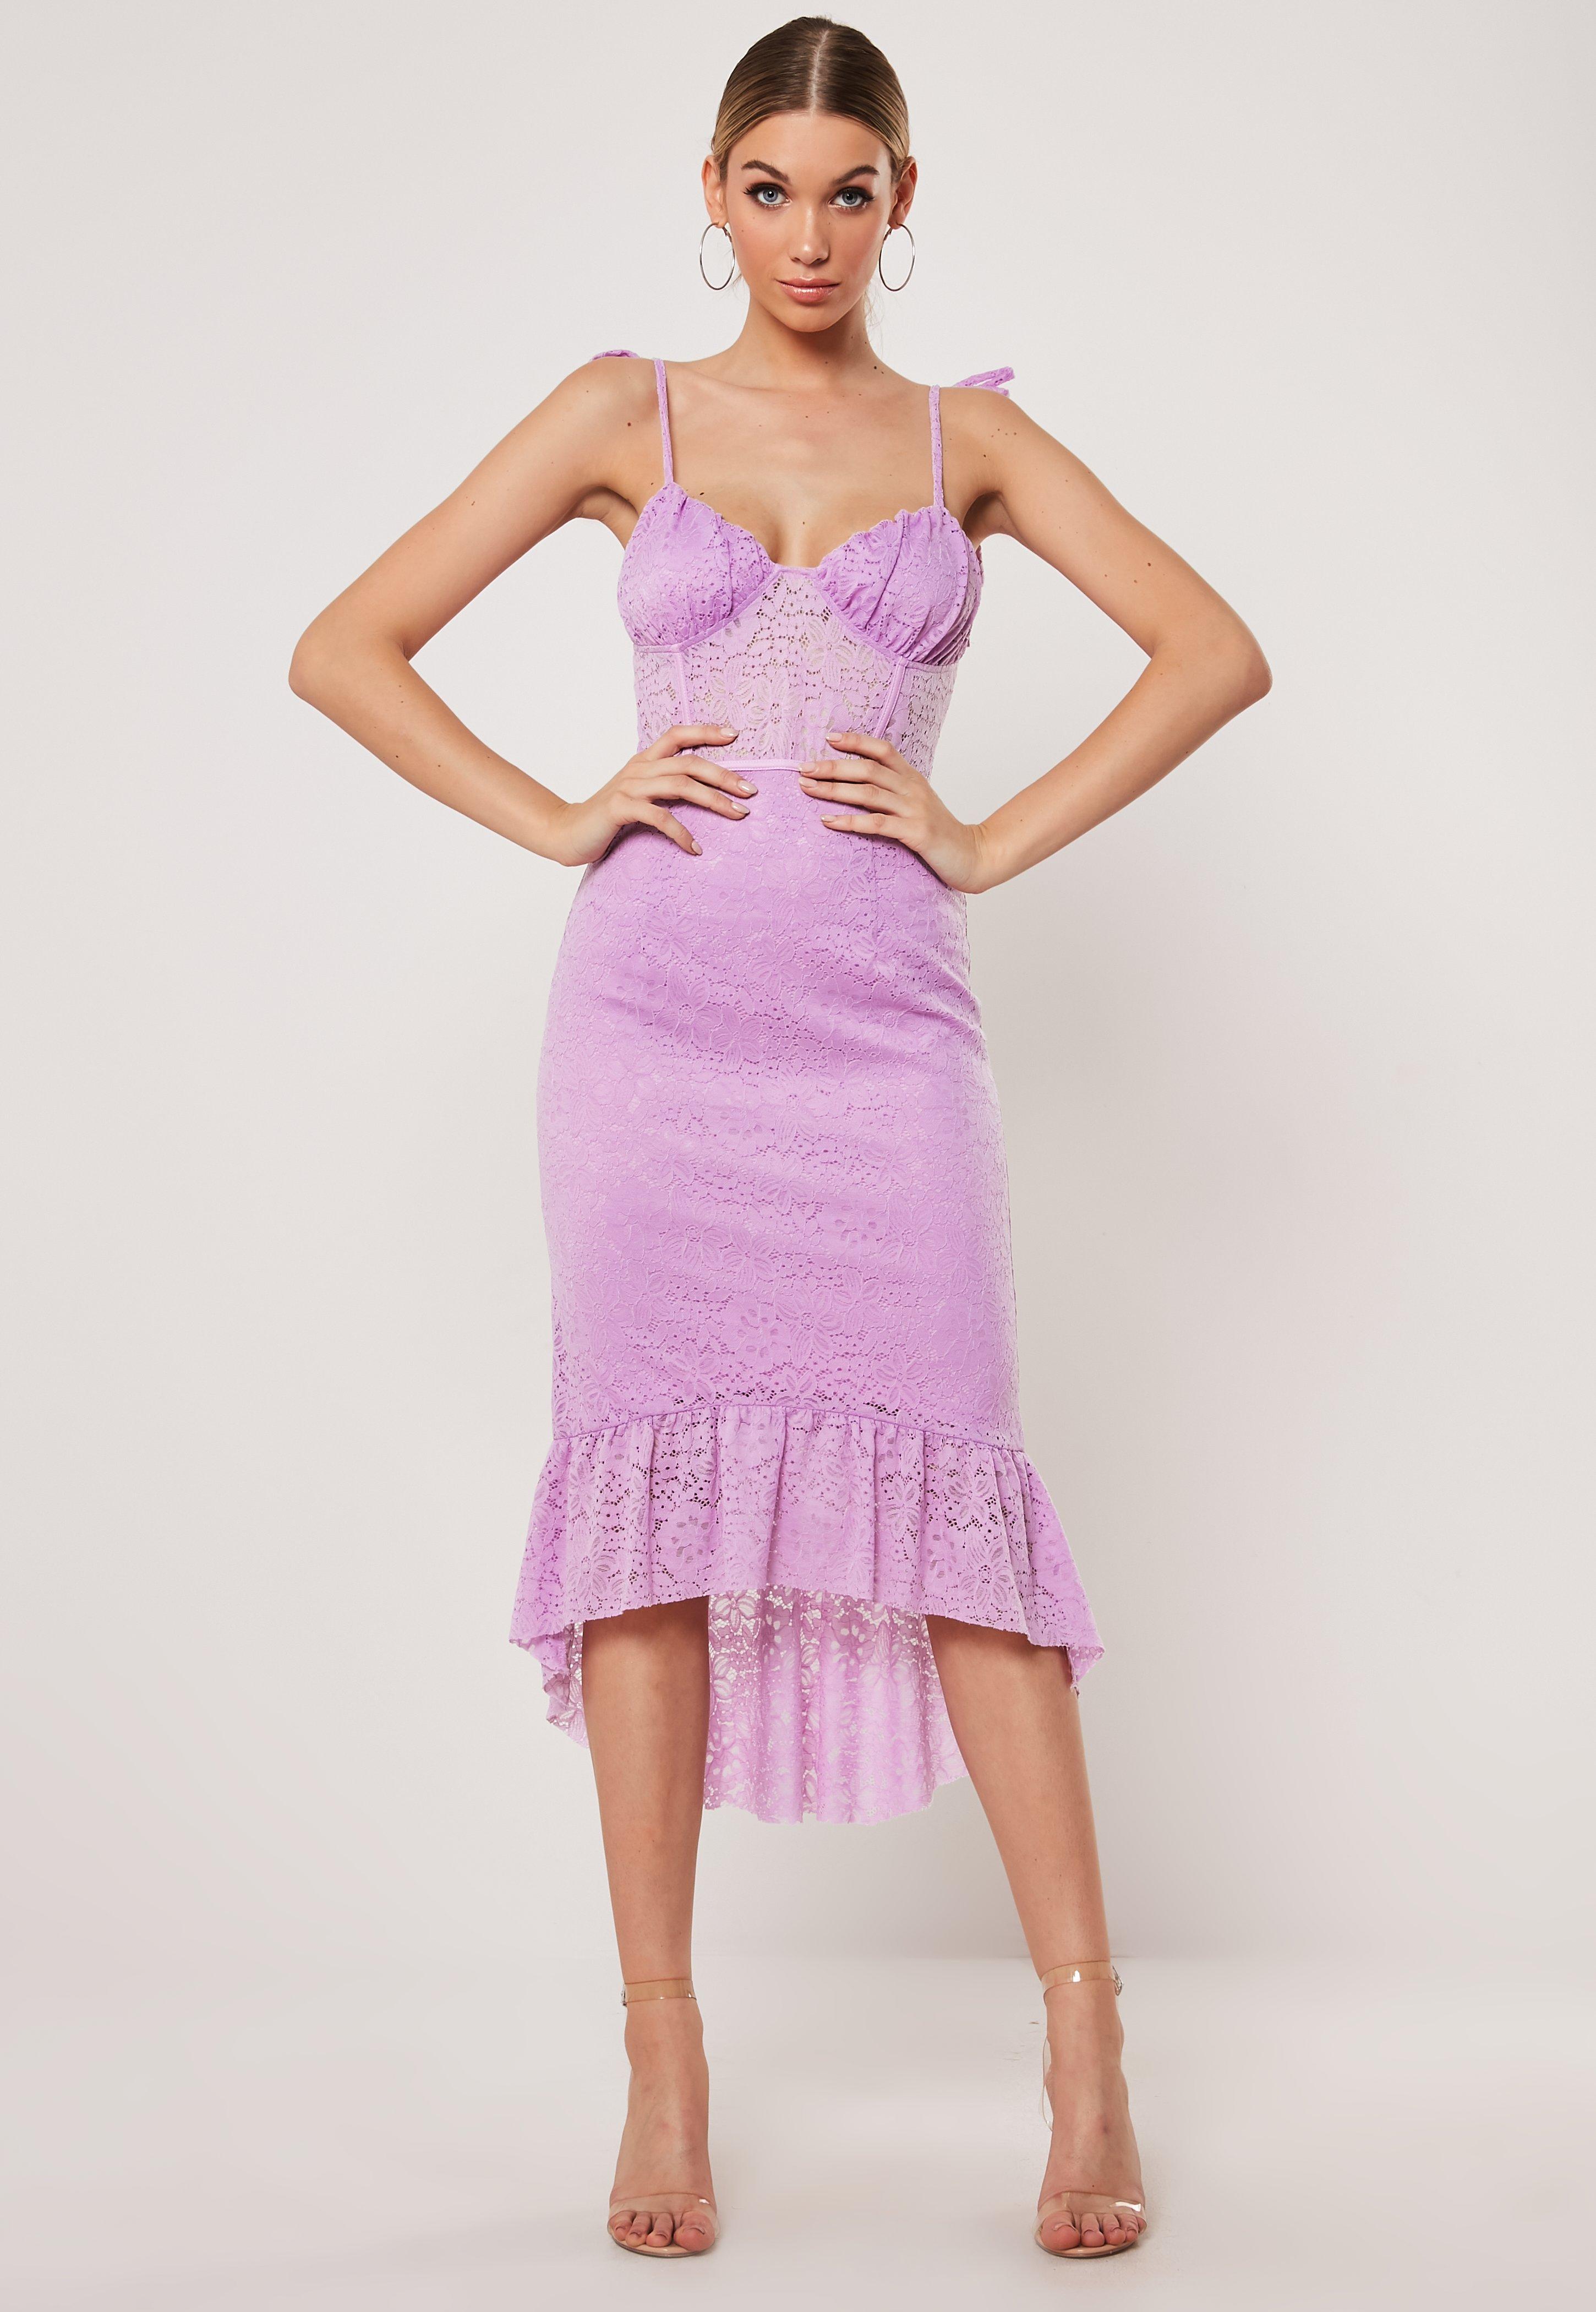 5e3a2911587 Formal Dresses - Long   Short Formal Dresses - Missguided